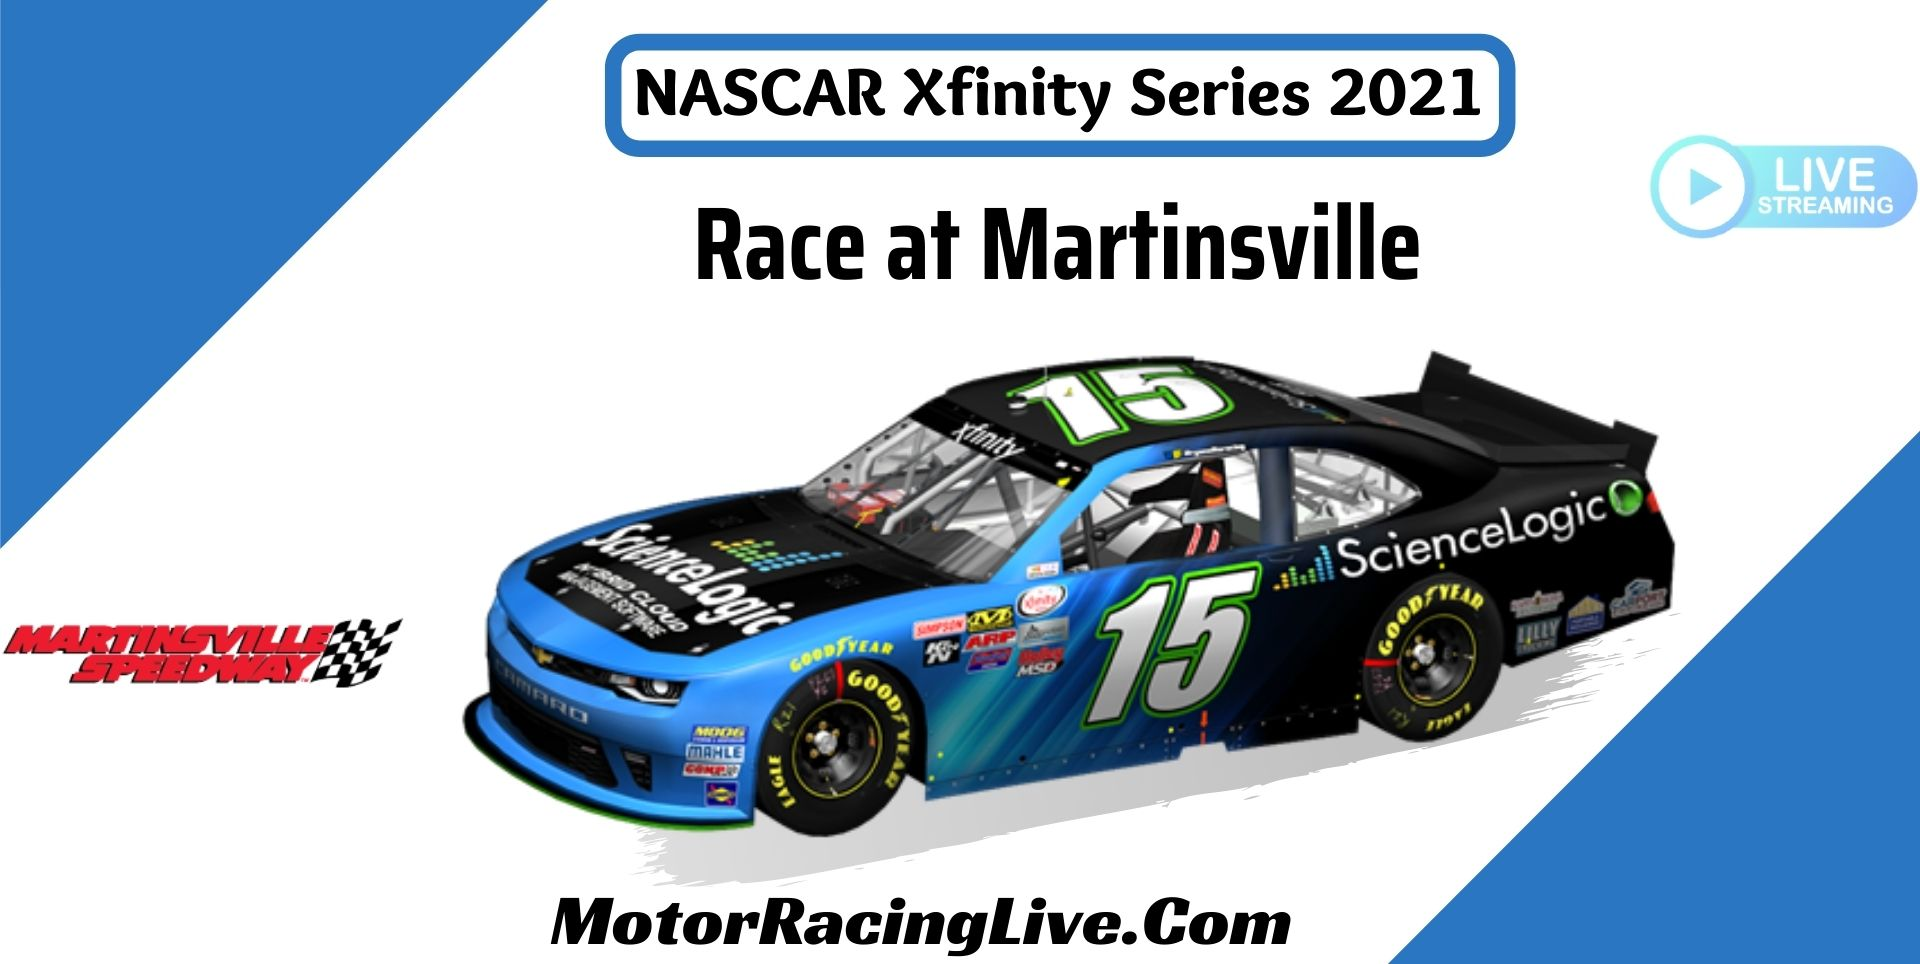 NASCAR Xfinity Race At Martinsville 2021 Live Stream